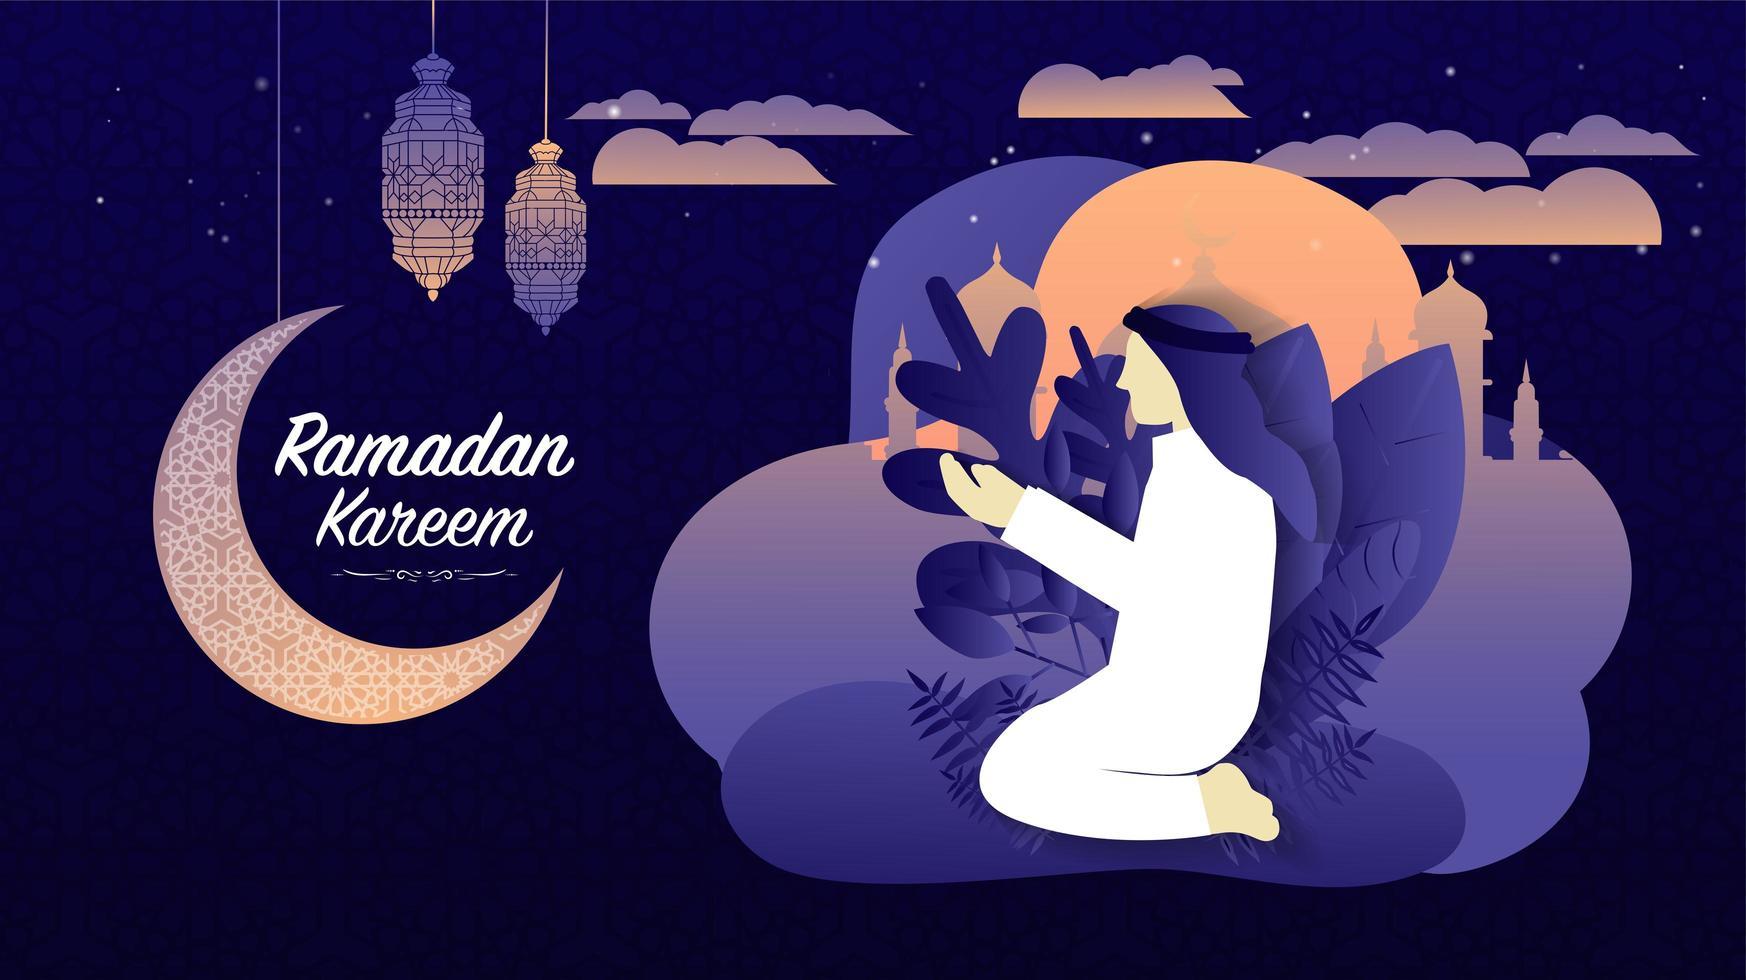 ramadan kareem o eid mubarak islamico viola moderno sfondo vettore